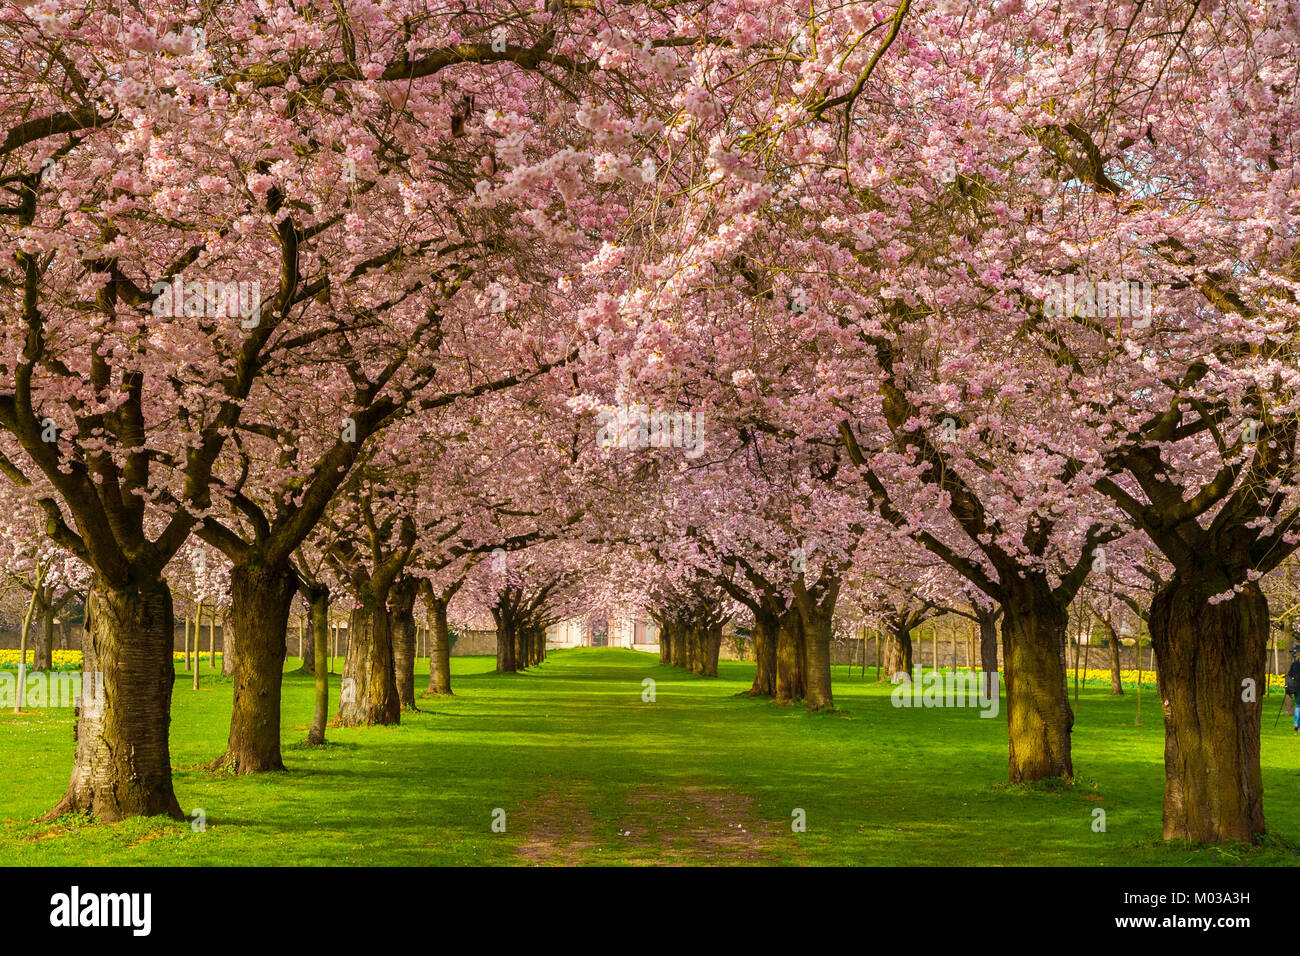 Beautiful cherry blossom avenue in the Schwetzingen garden, Germany. - Stock Image